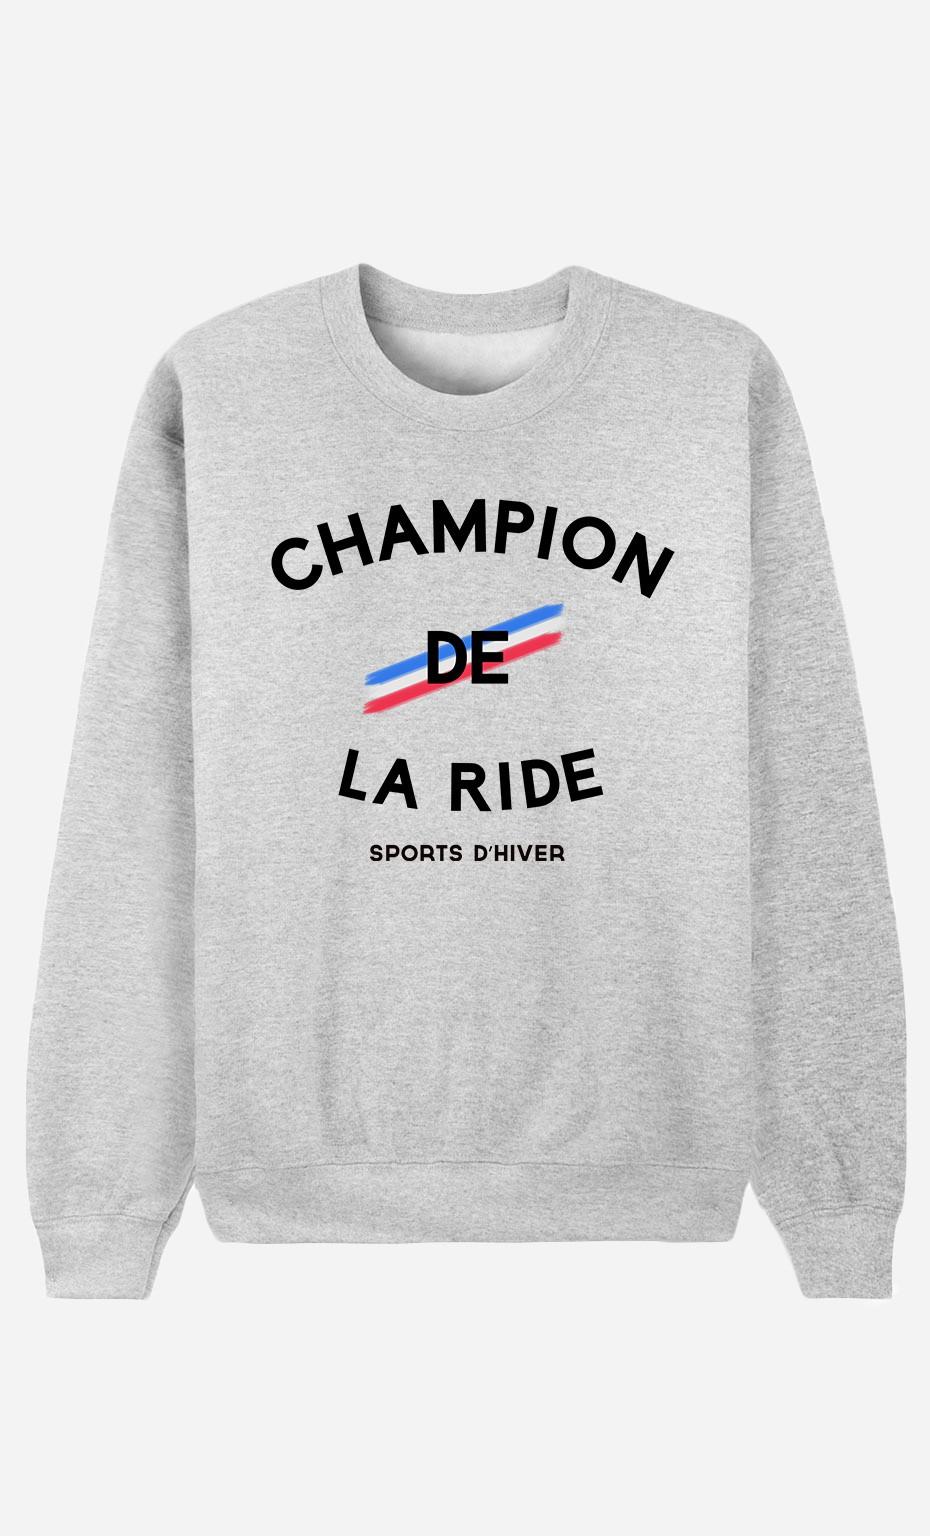 Sweat Femme Champion de la Ride